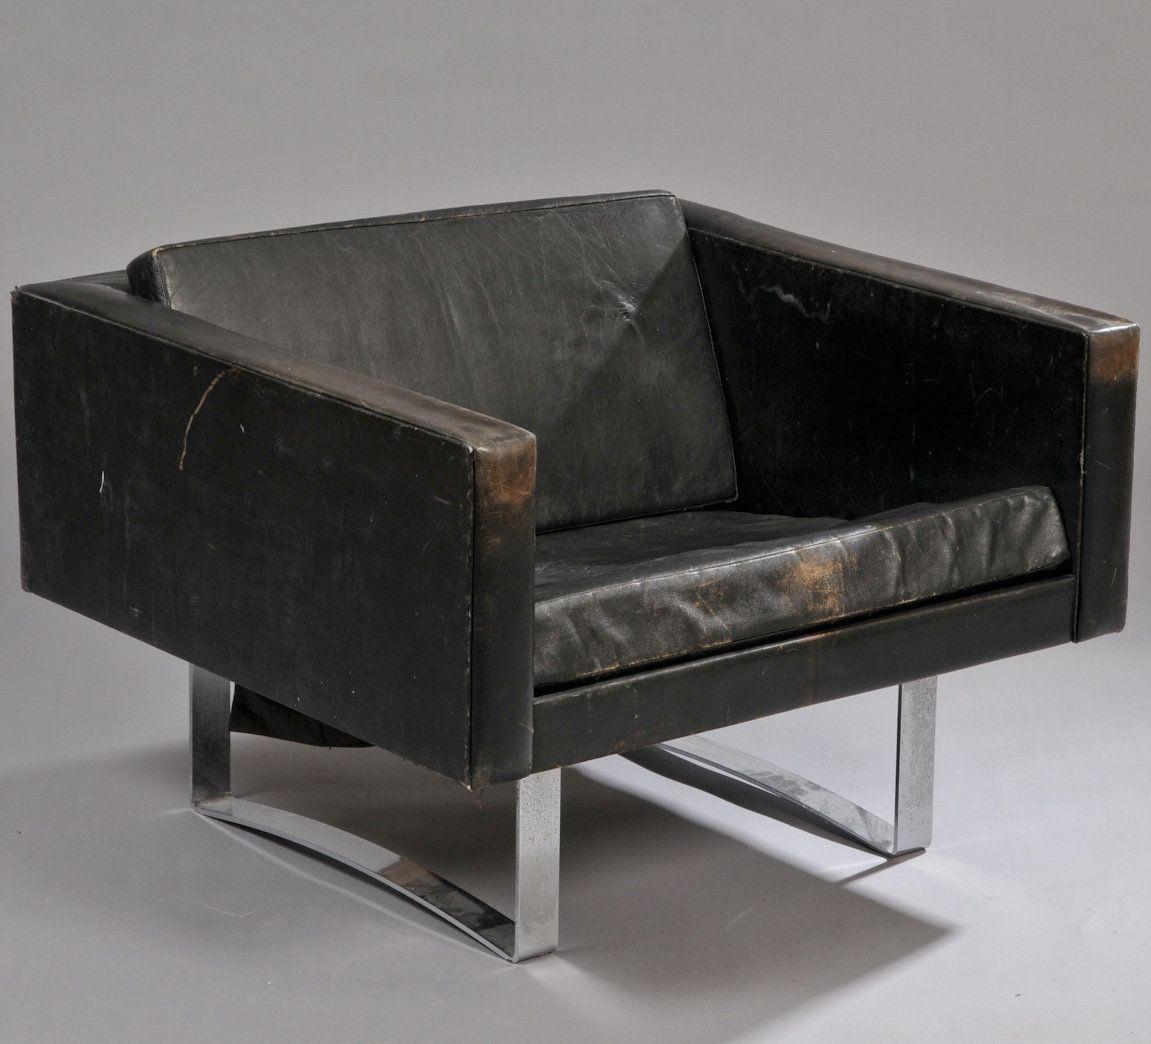 Bodil Kjaer; Chromed Steel and Leather Lounge Chair for Hovedstadens Møbelfabrik, 1959.